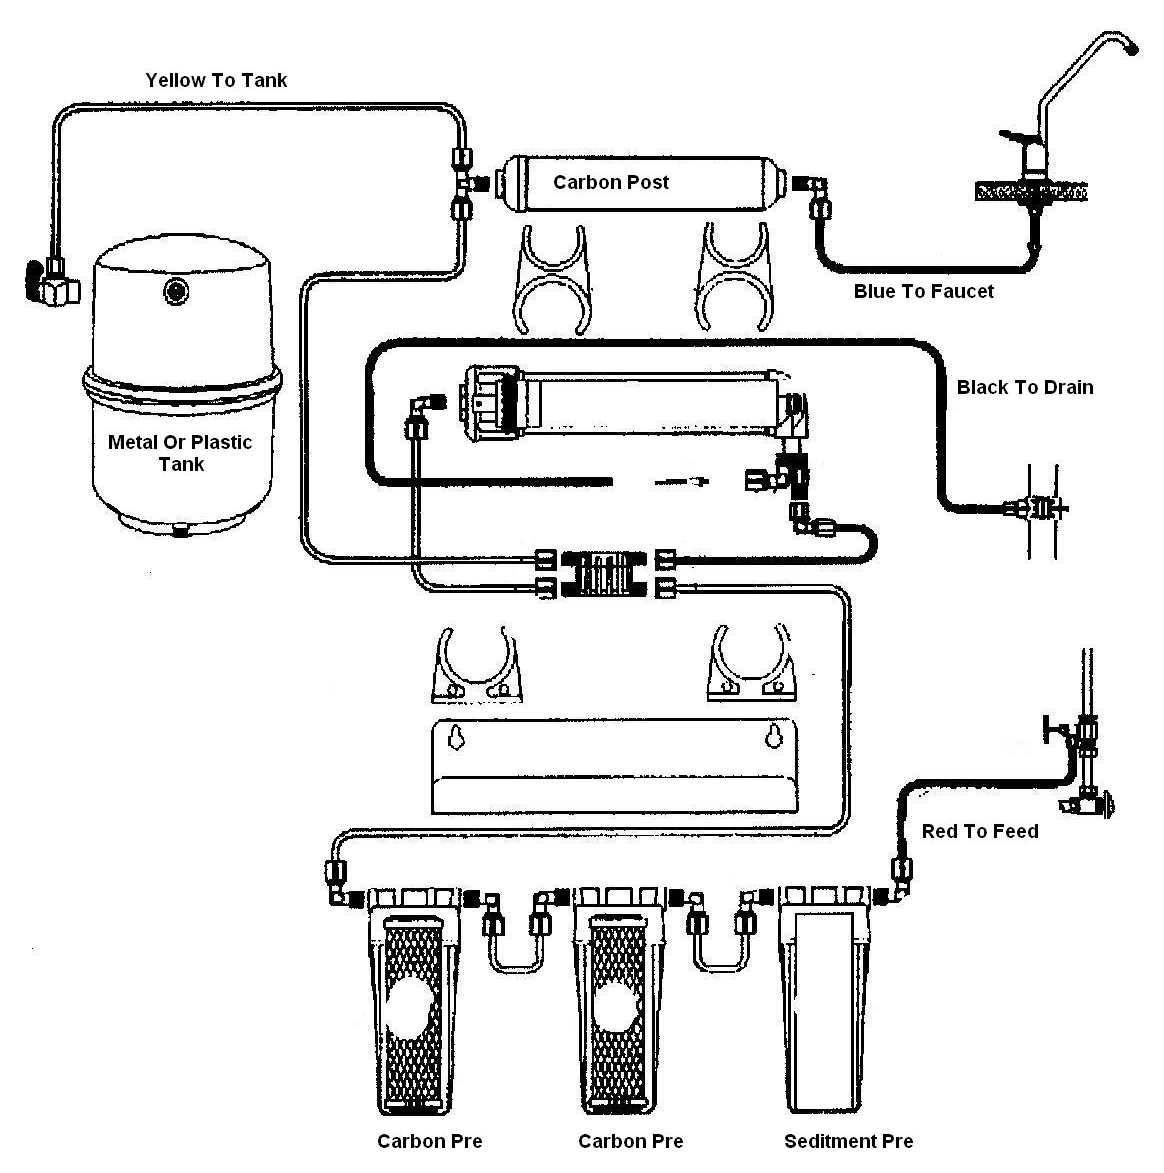 reverse osmosis water filter system diagram [ 1164 x 1173 Pixel ]